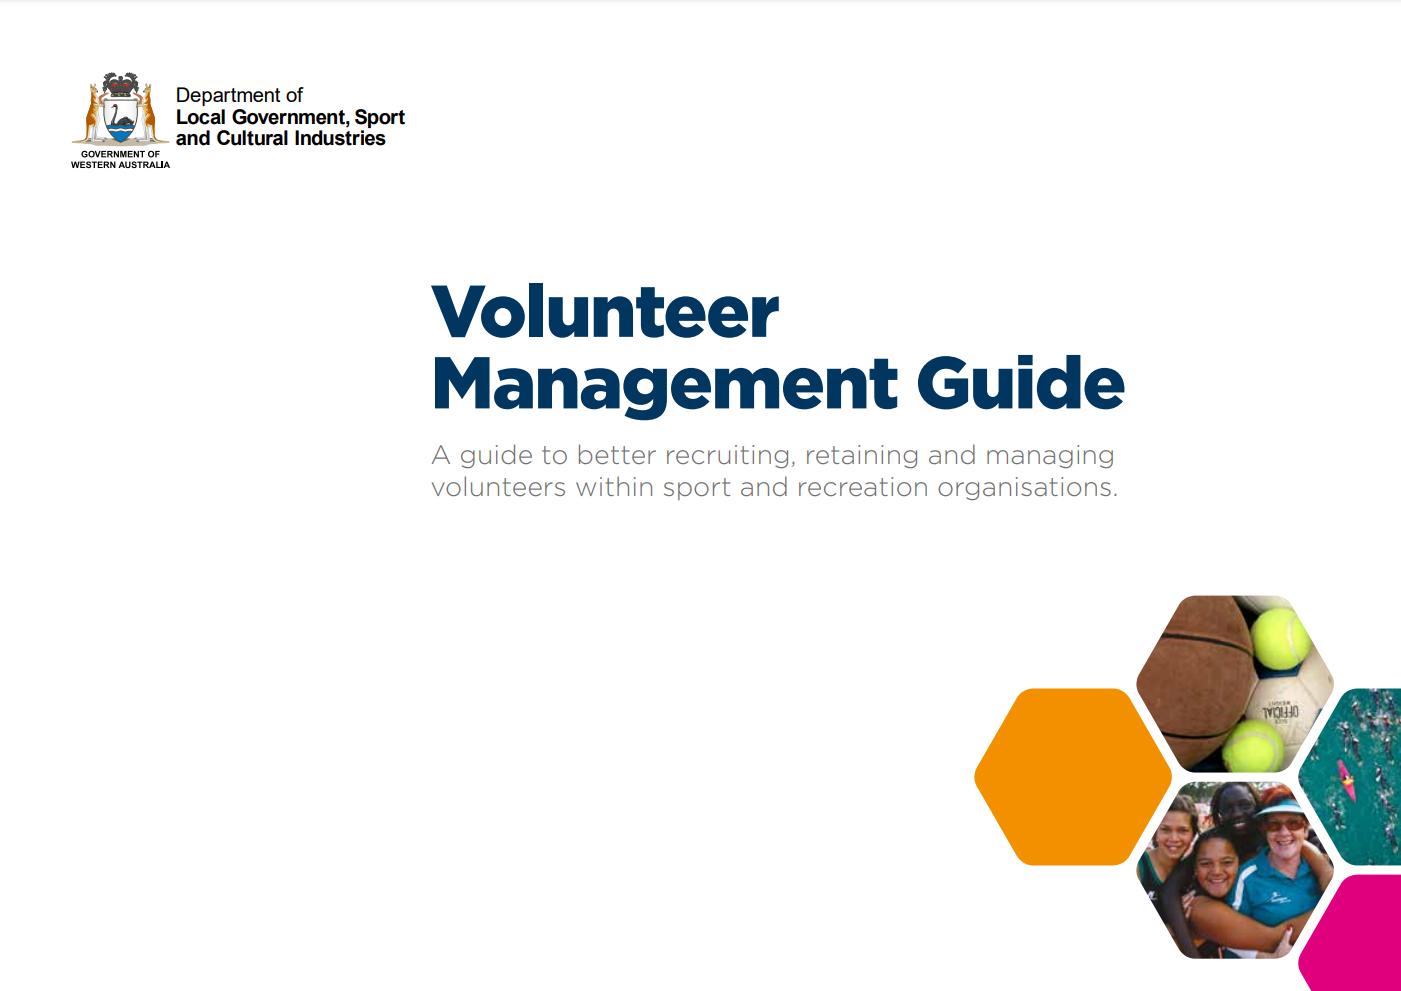 Volunteer Management Guide cover